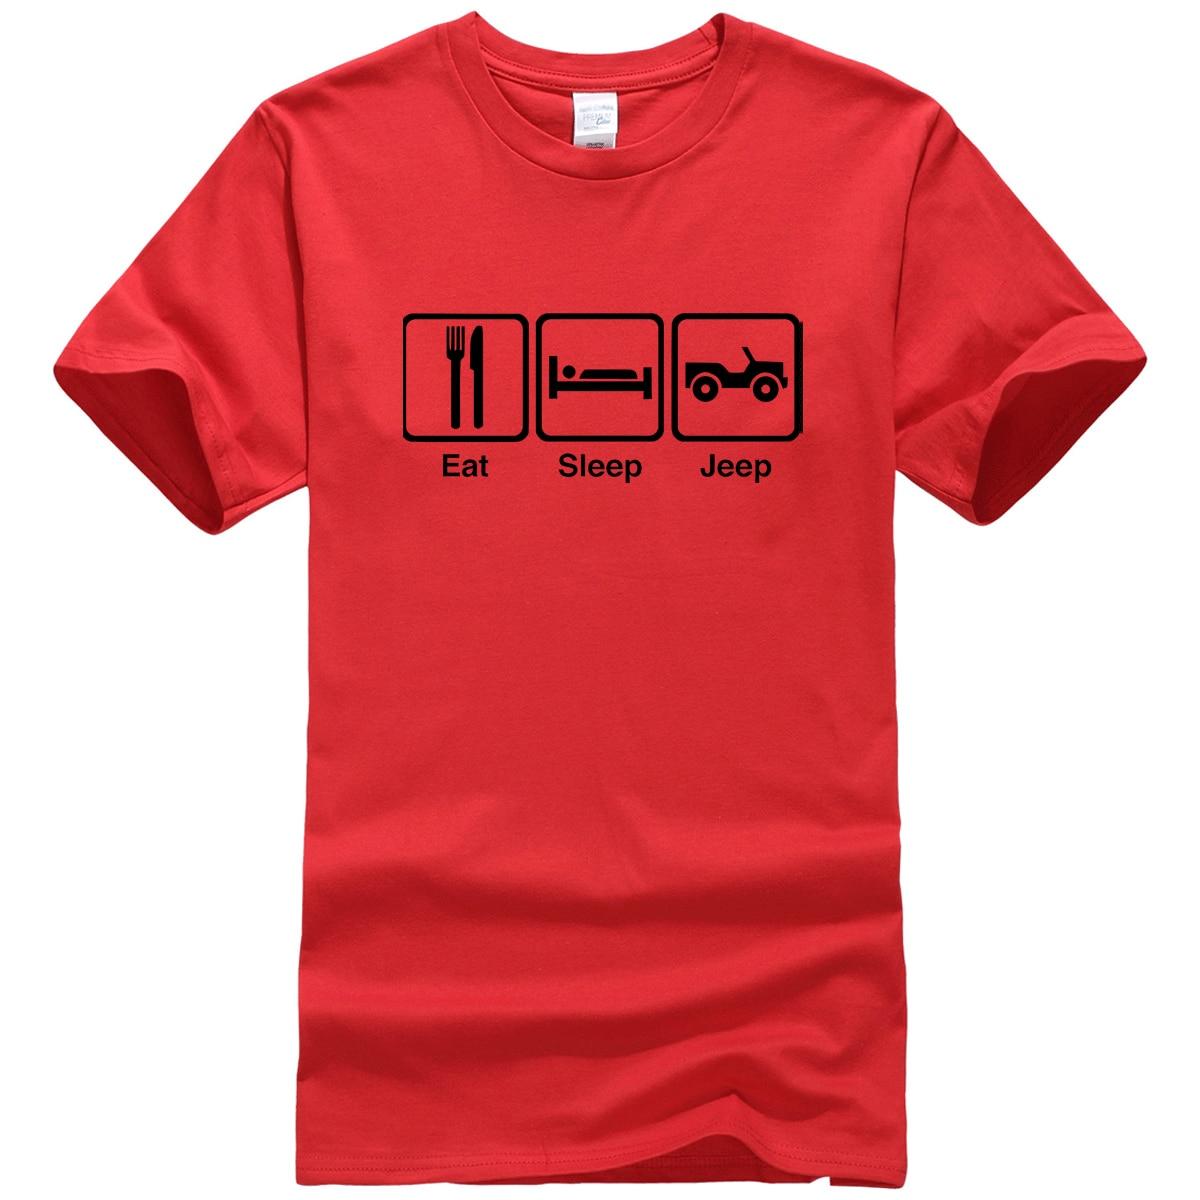 Casual T-shirt For Men 2019 Summer Short Sleeve Cotton T Shirt Men Print EAT SLEEP Funny Tshirt Brand Top Tee Shirts Harajuku